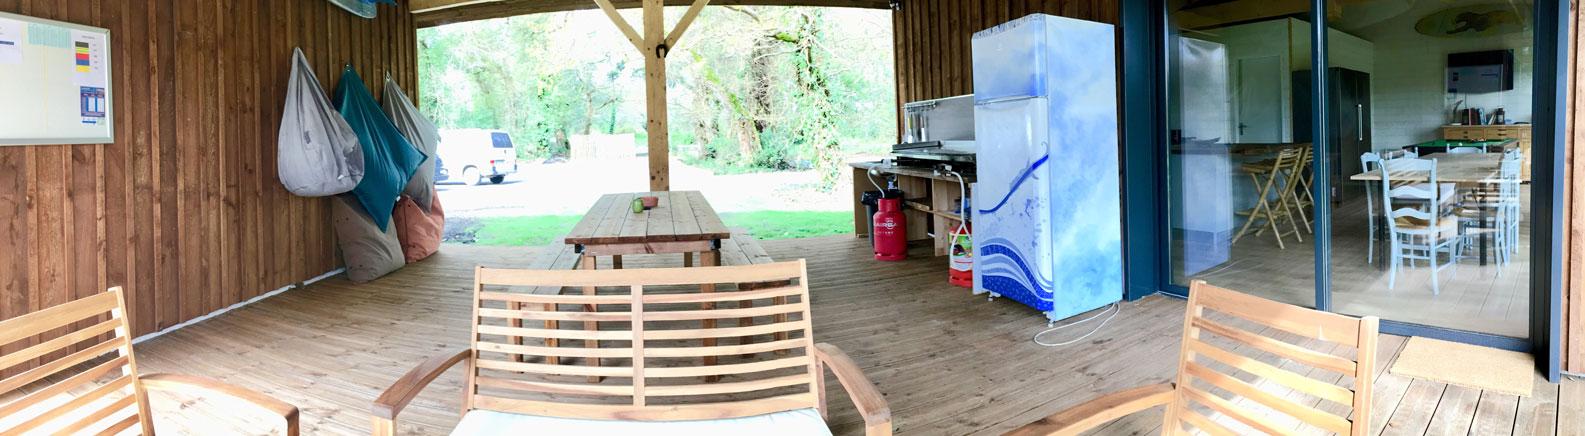 panoramique-terasse-cuisine-exterieur-nature-surf-camp